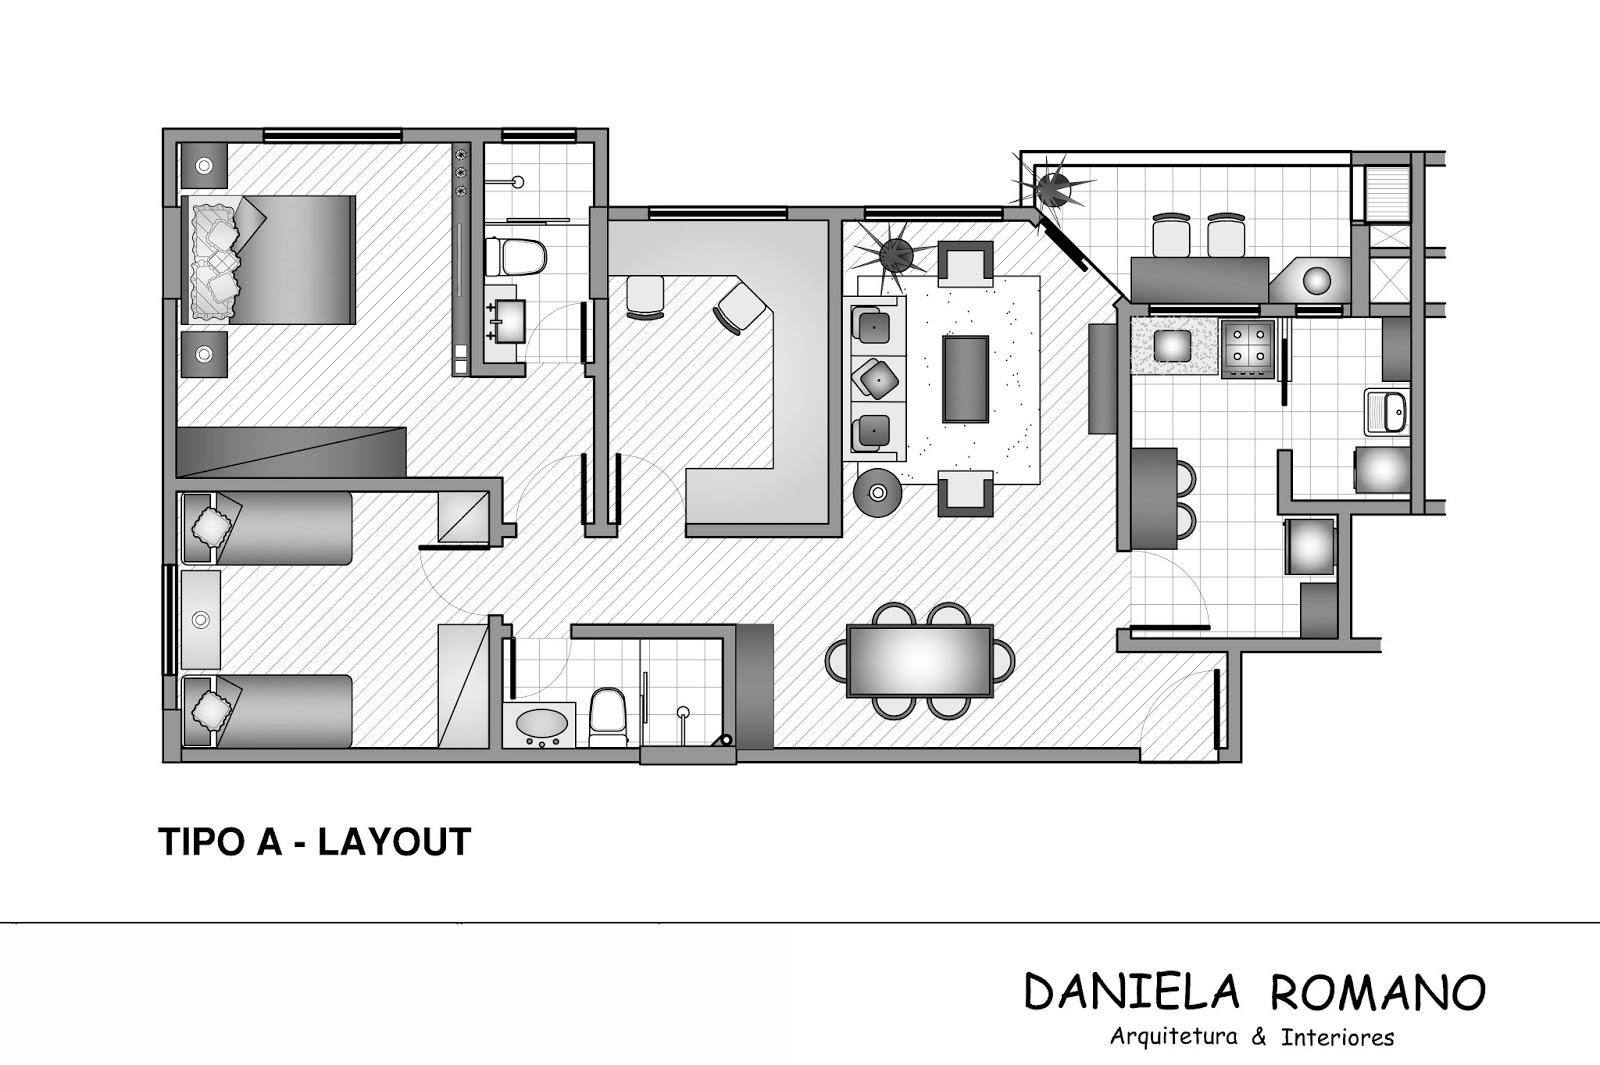 MARIANA PROJETISTA: Arquitetura #:Nichos de projeto de interiores #3C3C3C 1600 1065